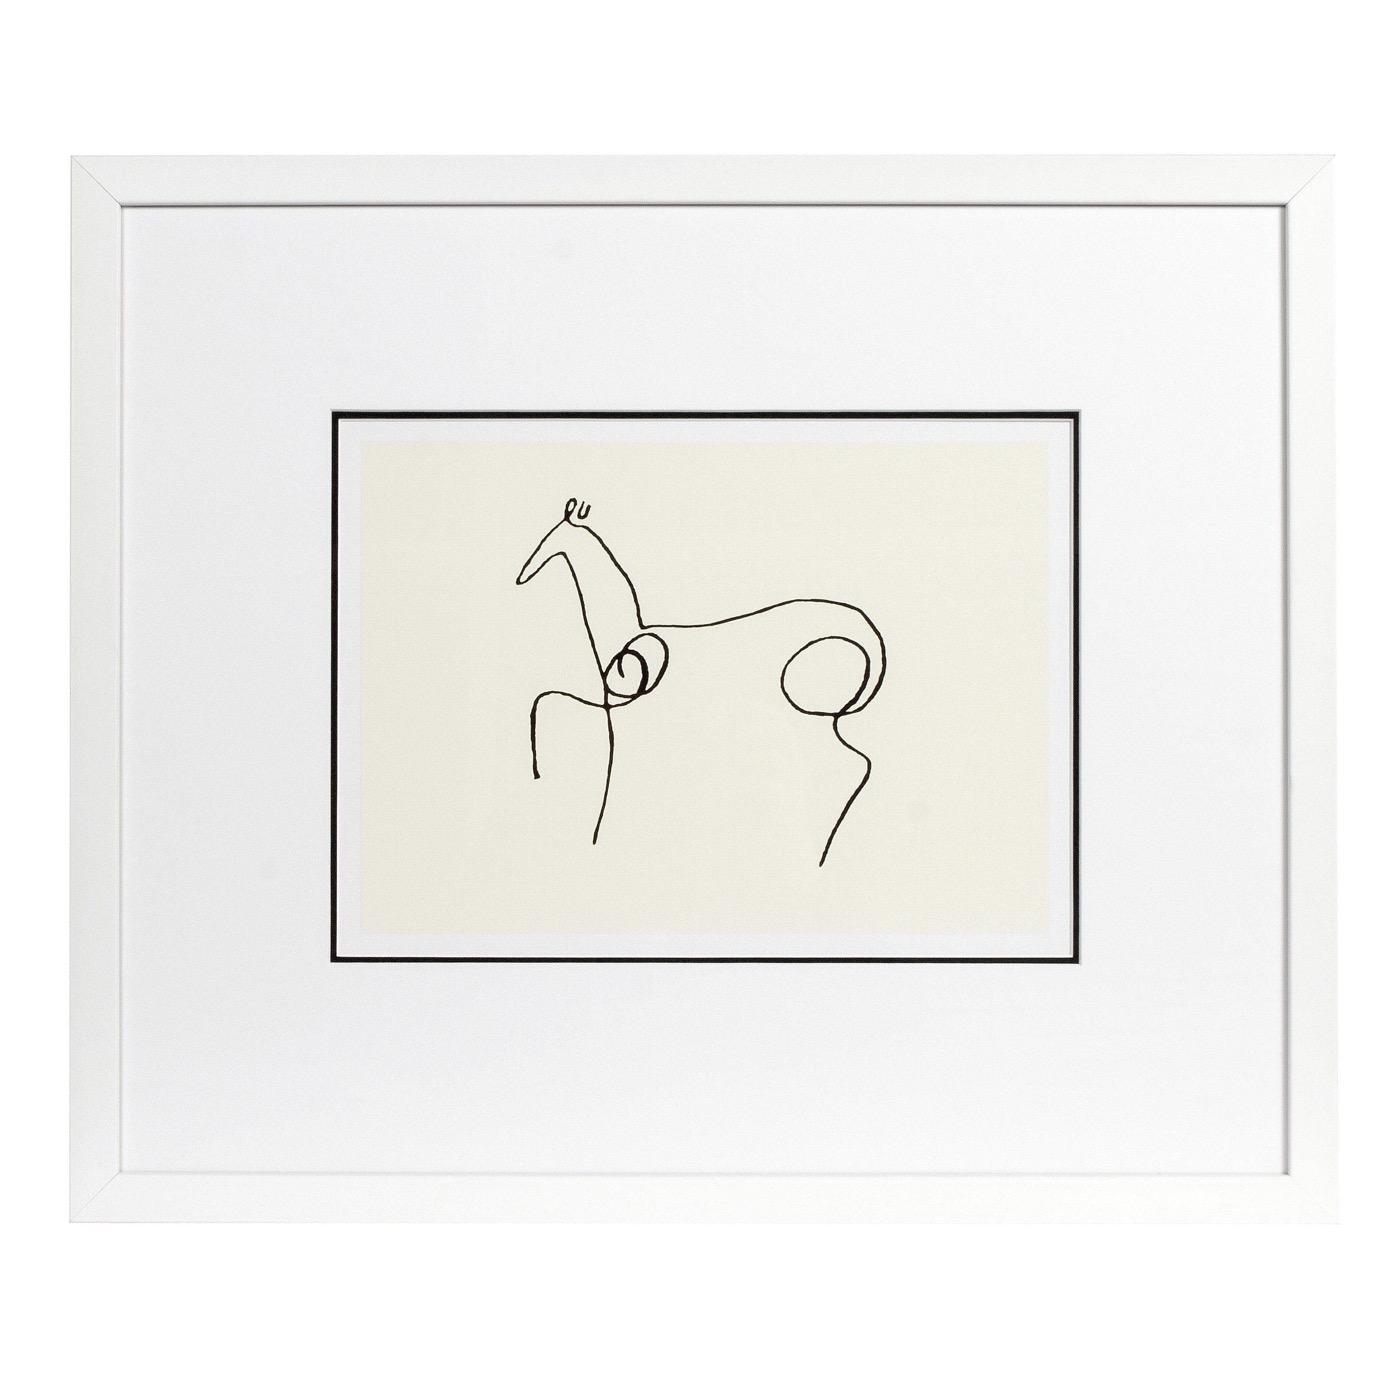 Picasso Prints | Set of 2